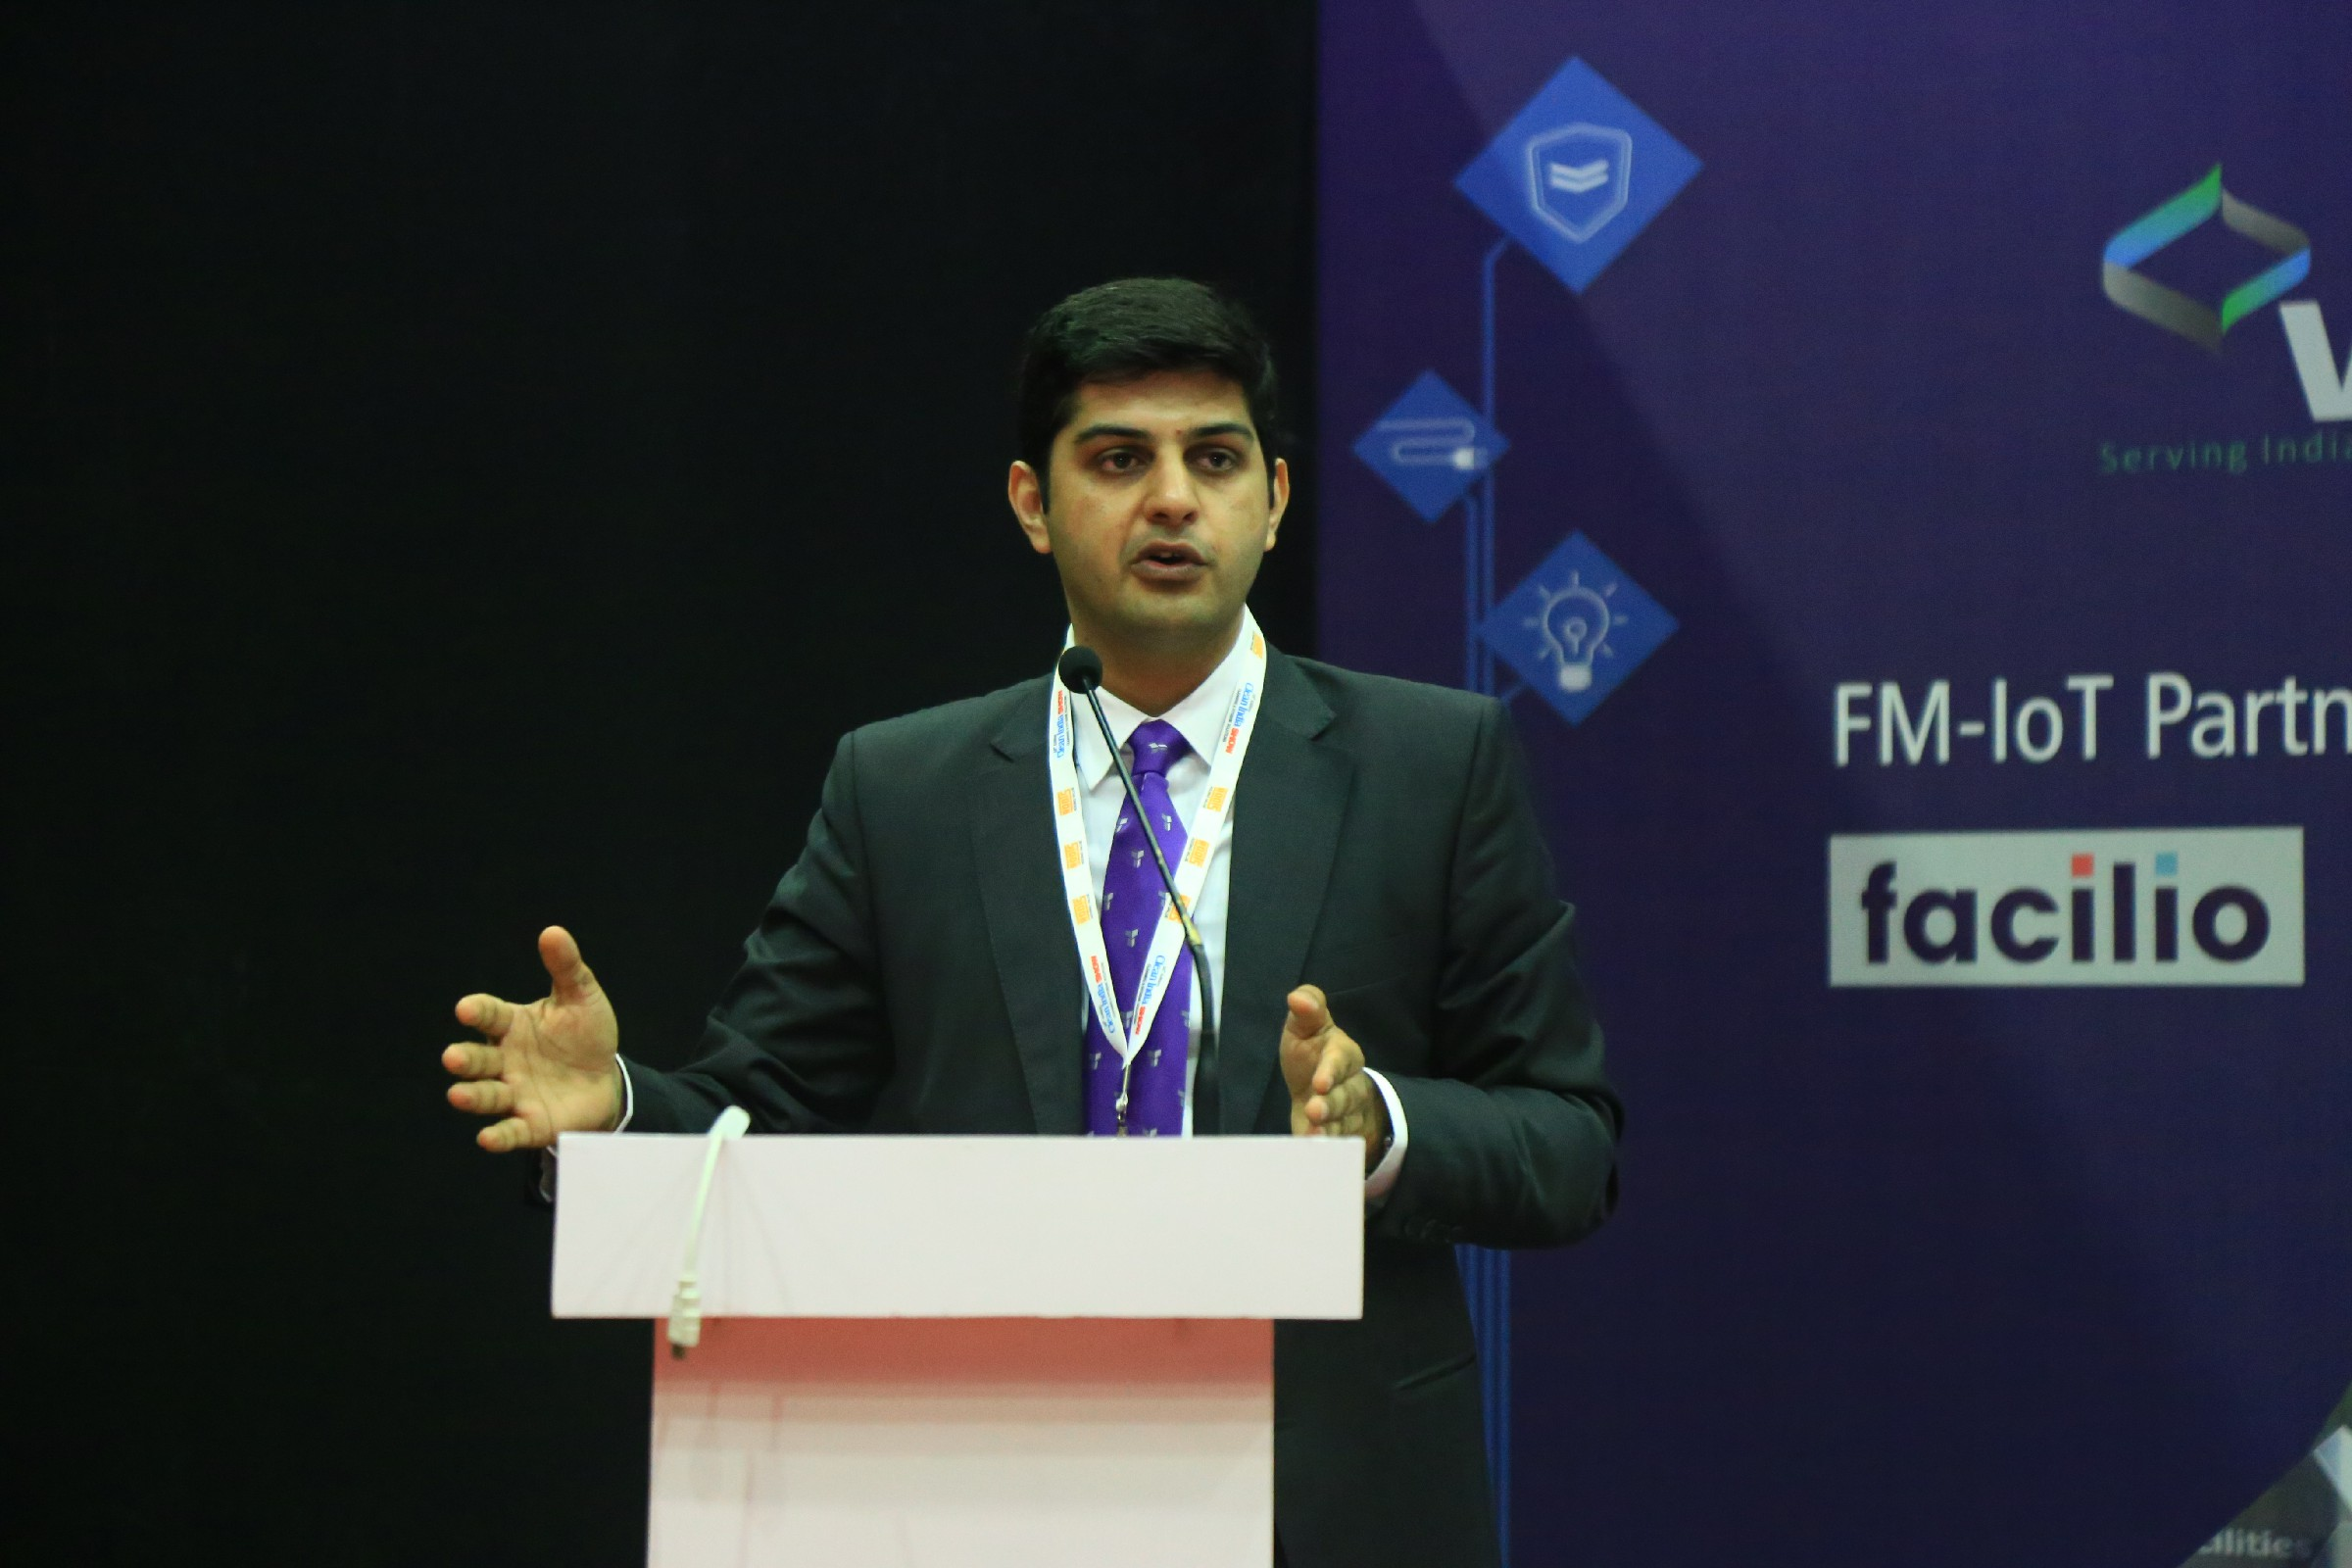 Angad-Rajain-Managing-Director-Tenon-Facilities-Management-India-Private-Limited-20